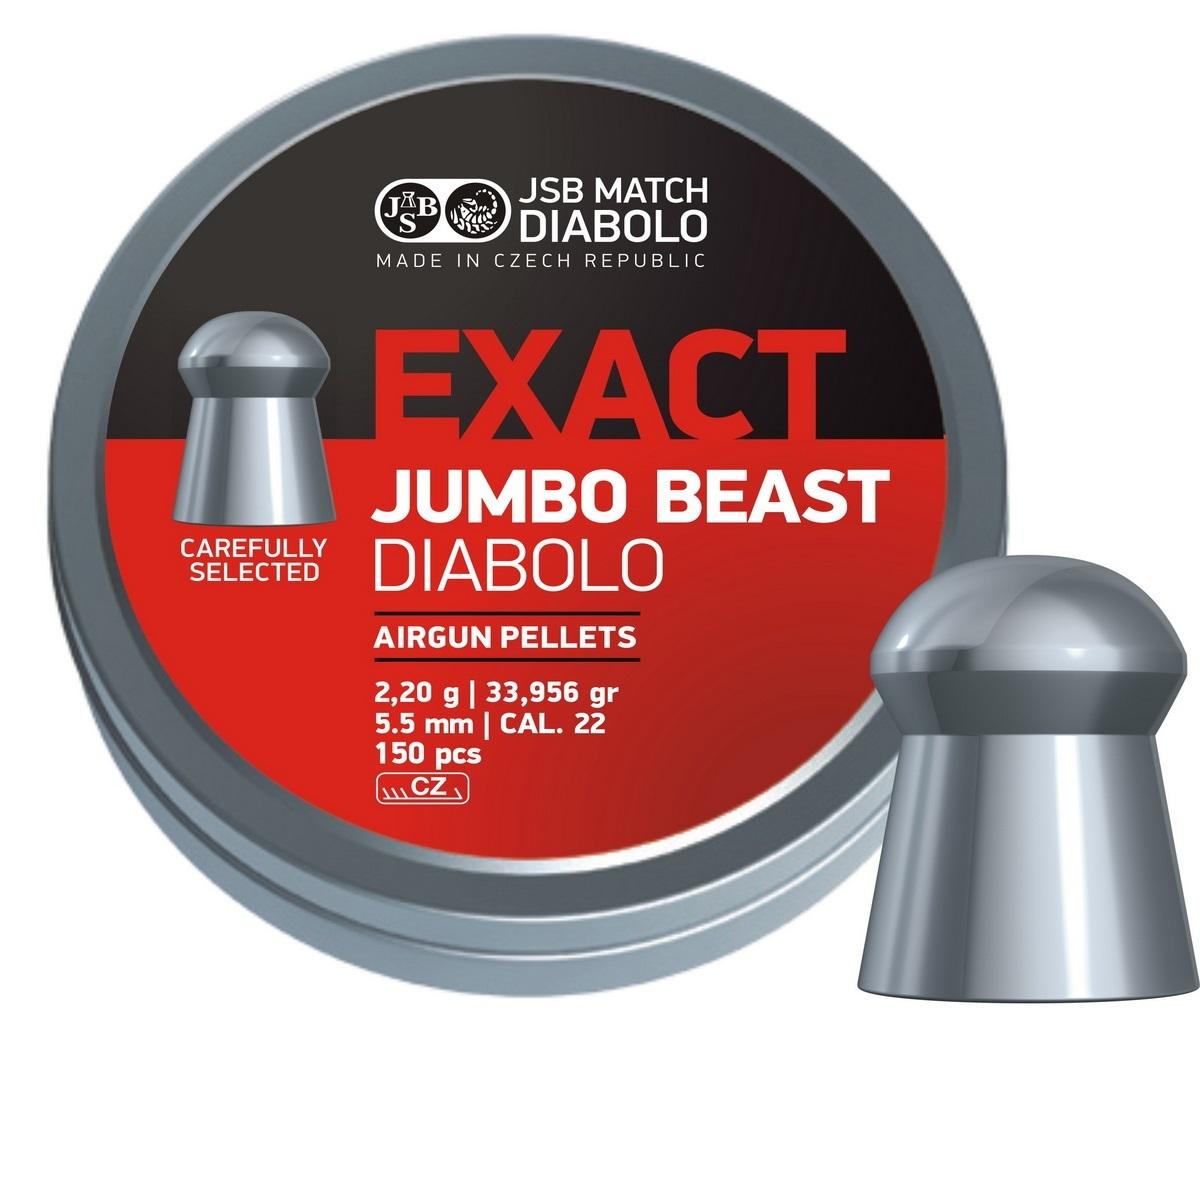 JSB ジャンボビースト 5.5mm